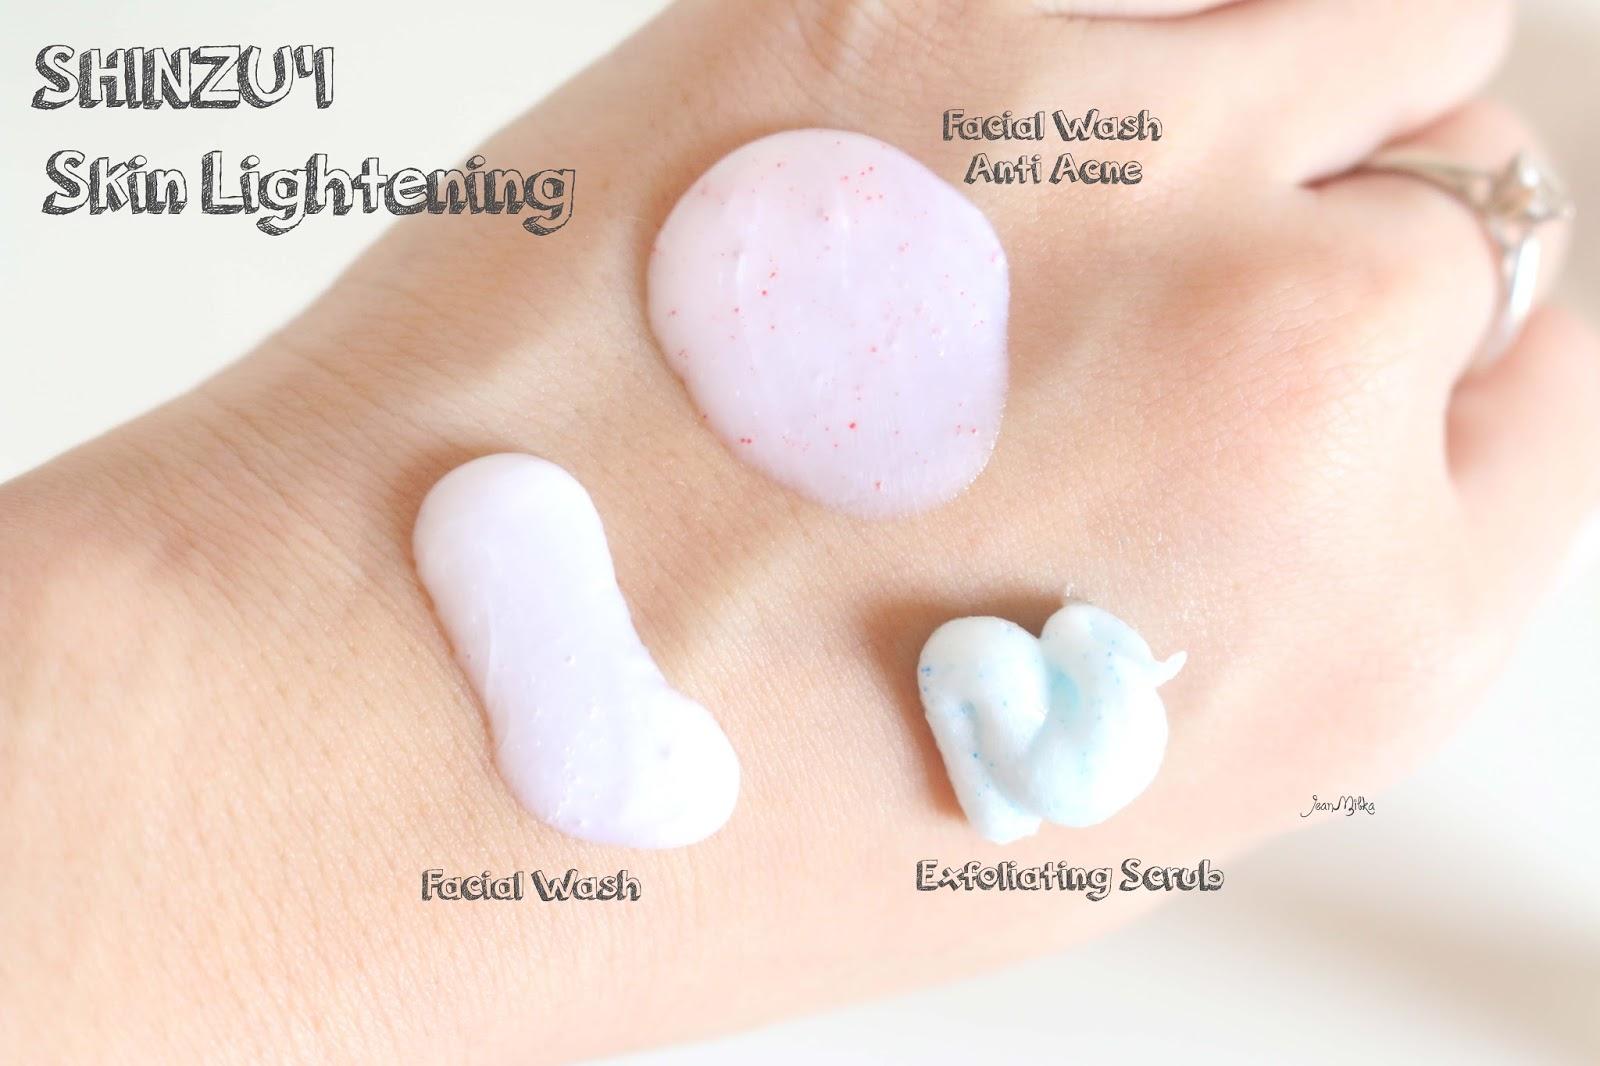 shinzui, putih itu shinzui, skin care, review shinzui, shinzui lightening series, shinzui scrub, shinzui facial wash, perawatan wajah, acne